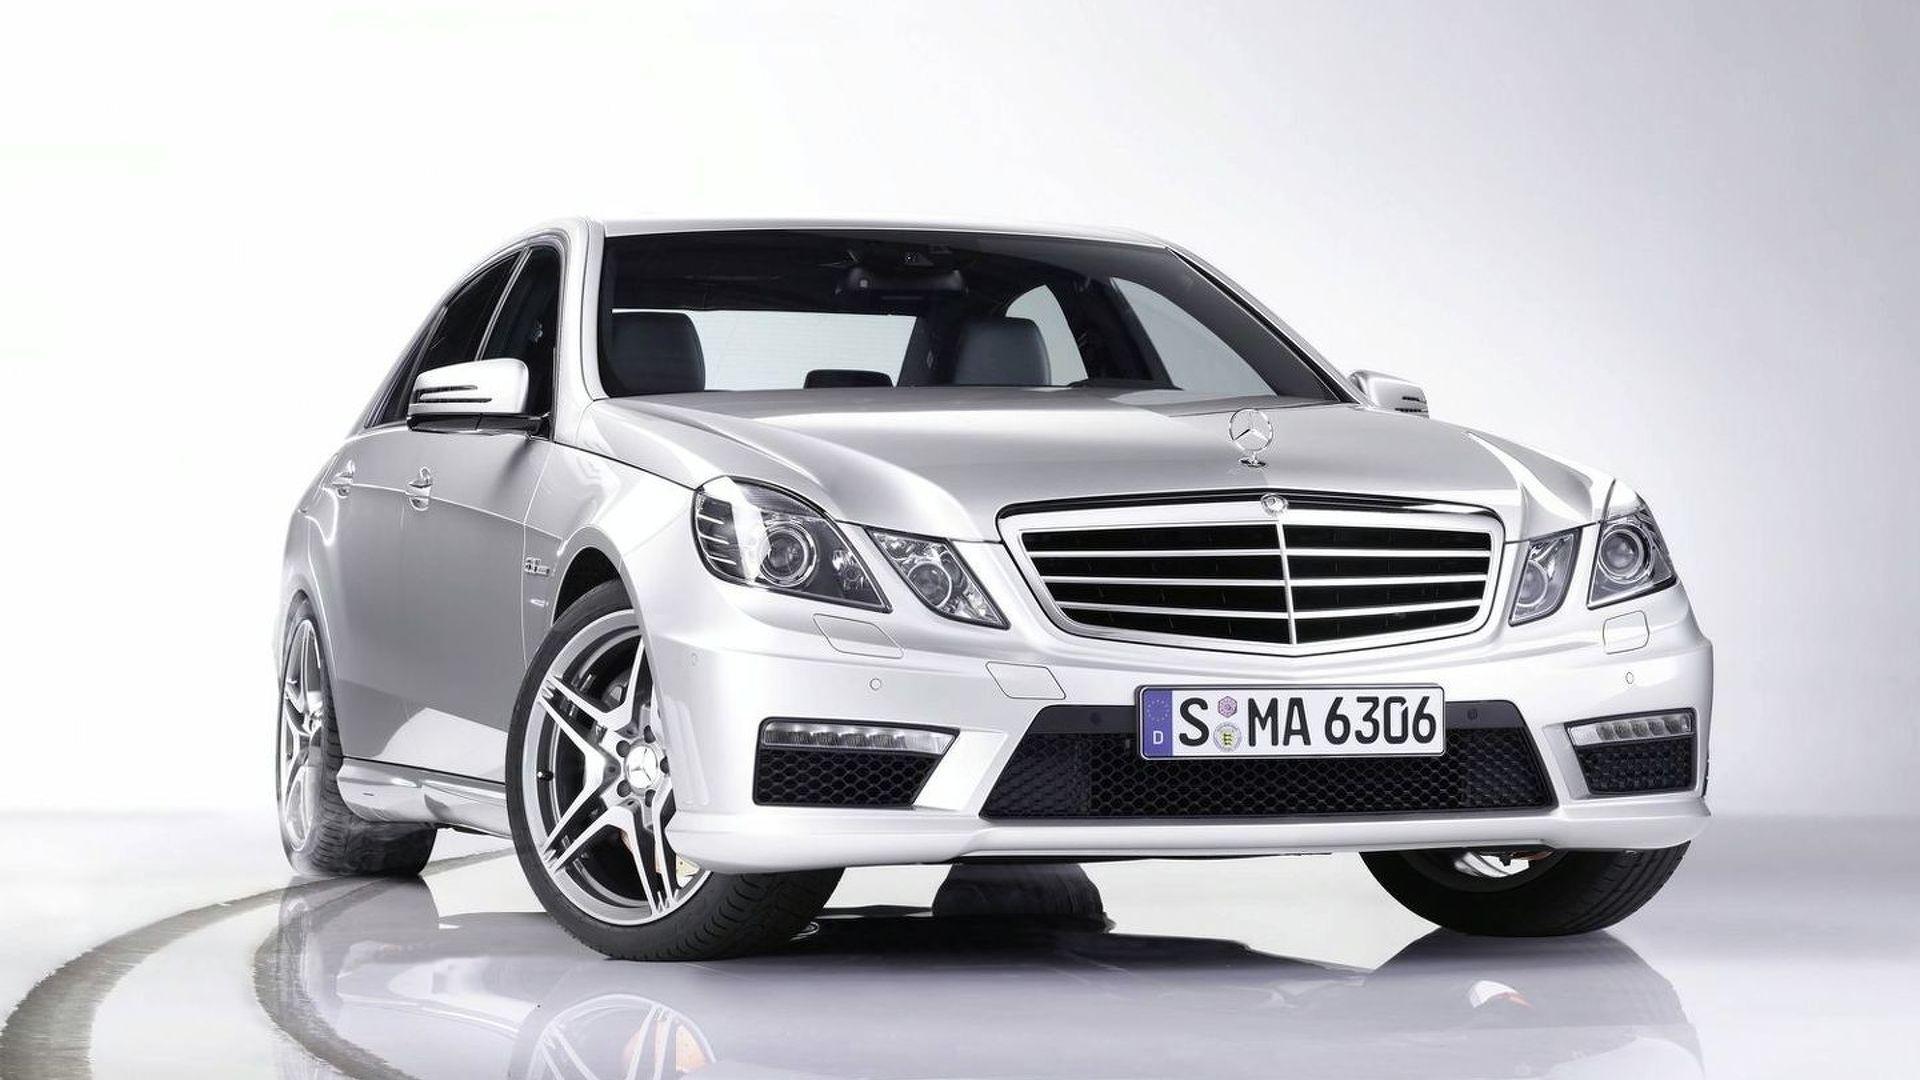 2015 Mercedes E-Class Superlight comes into focus - rumors